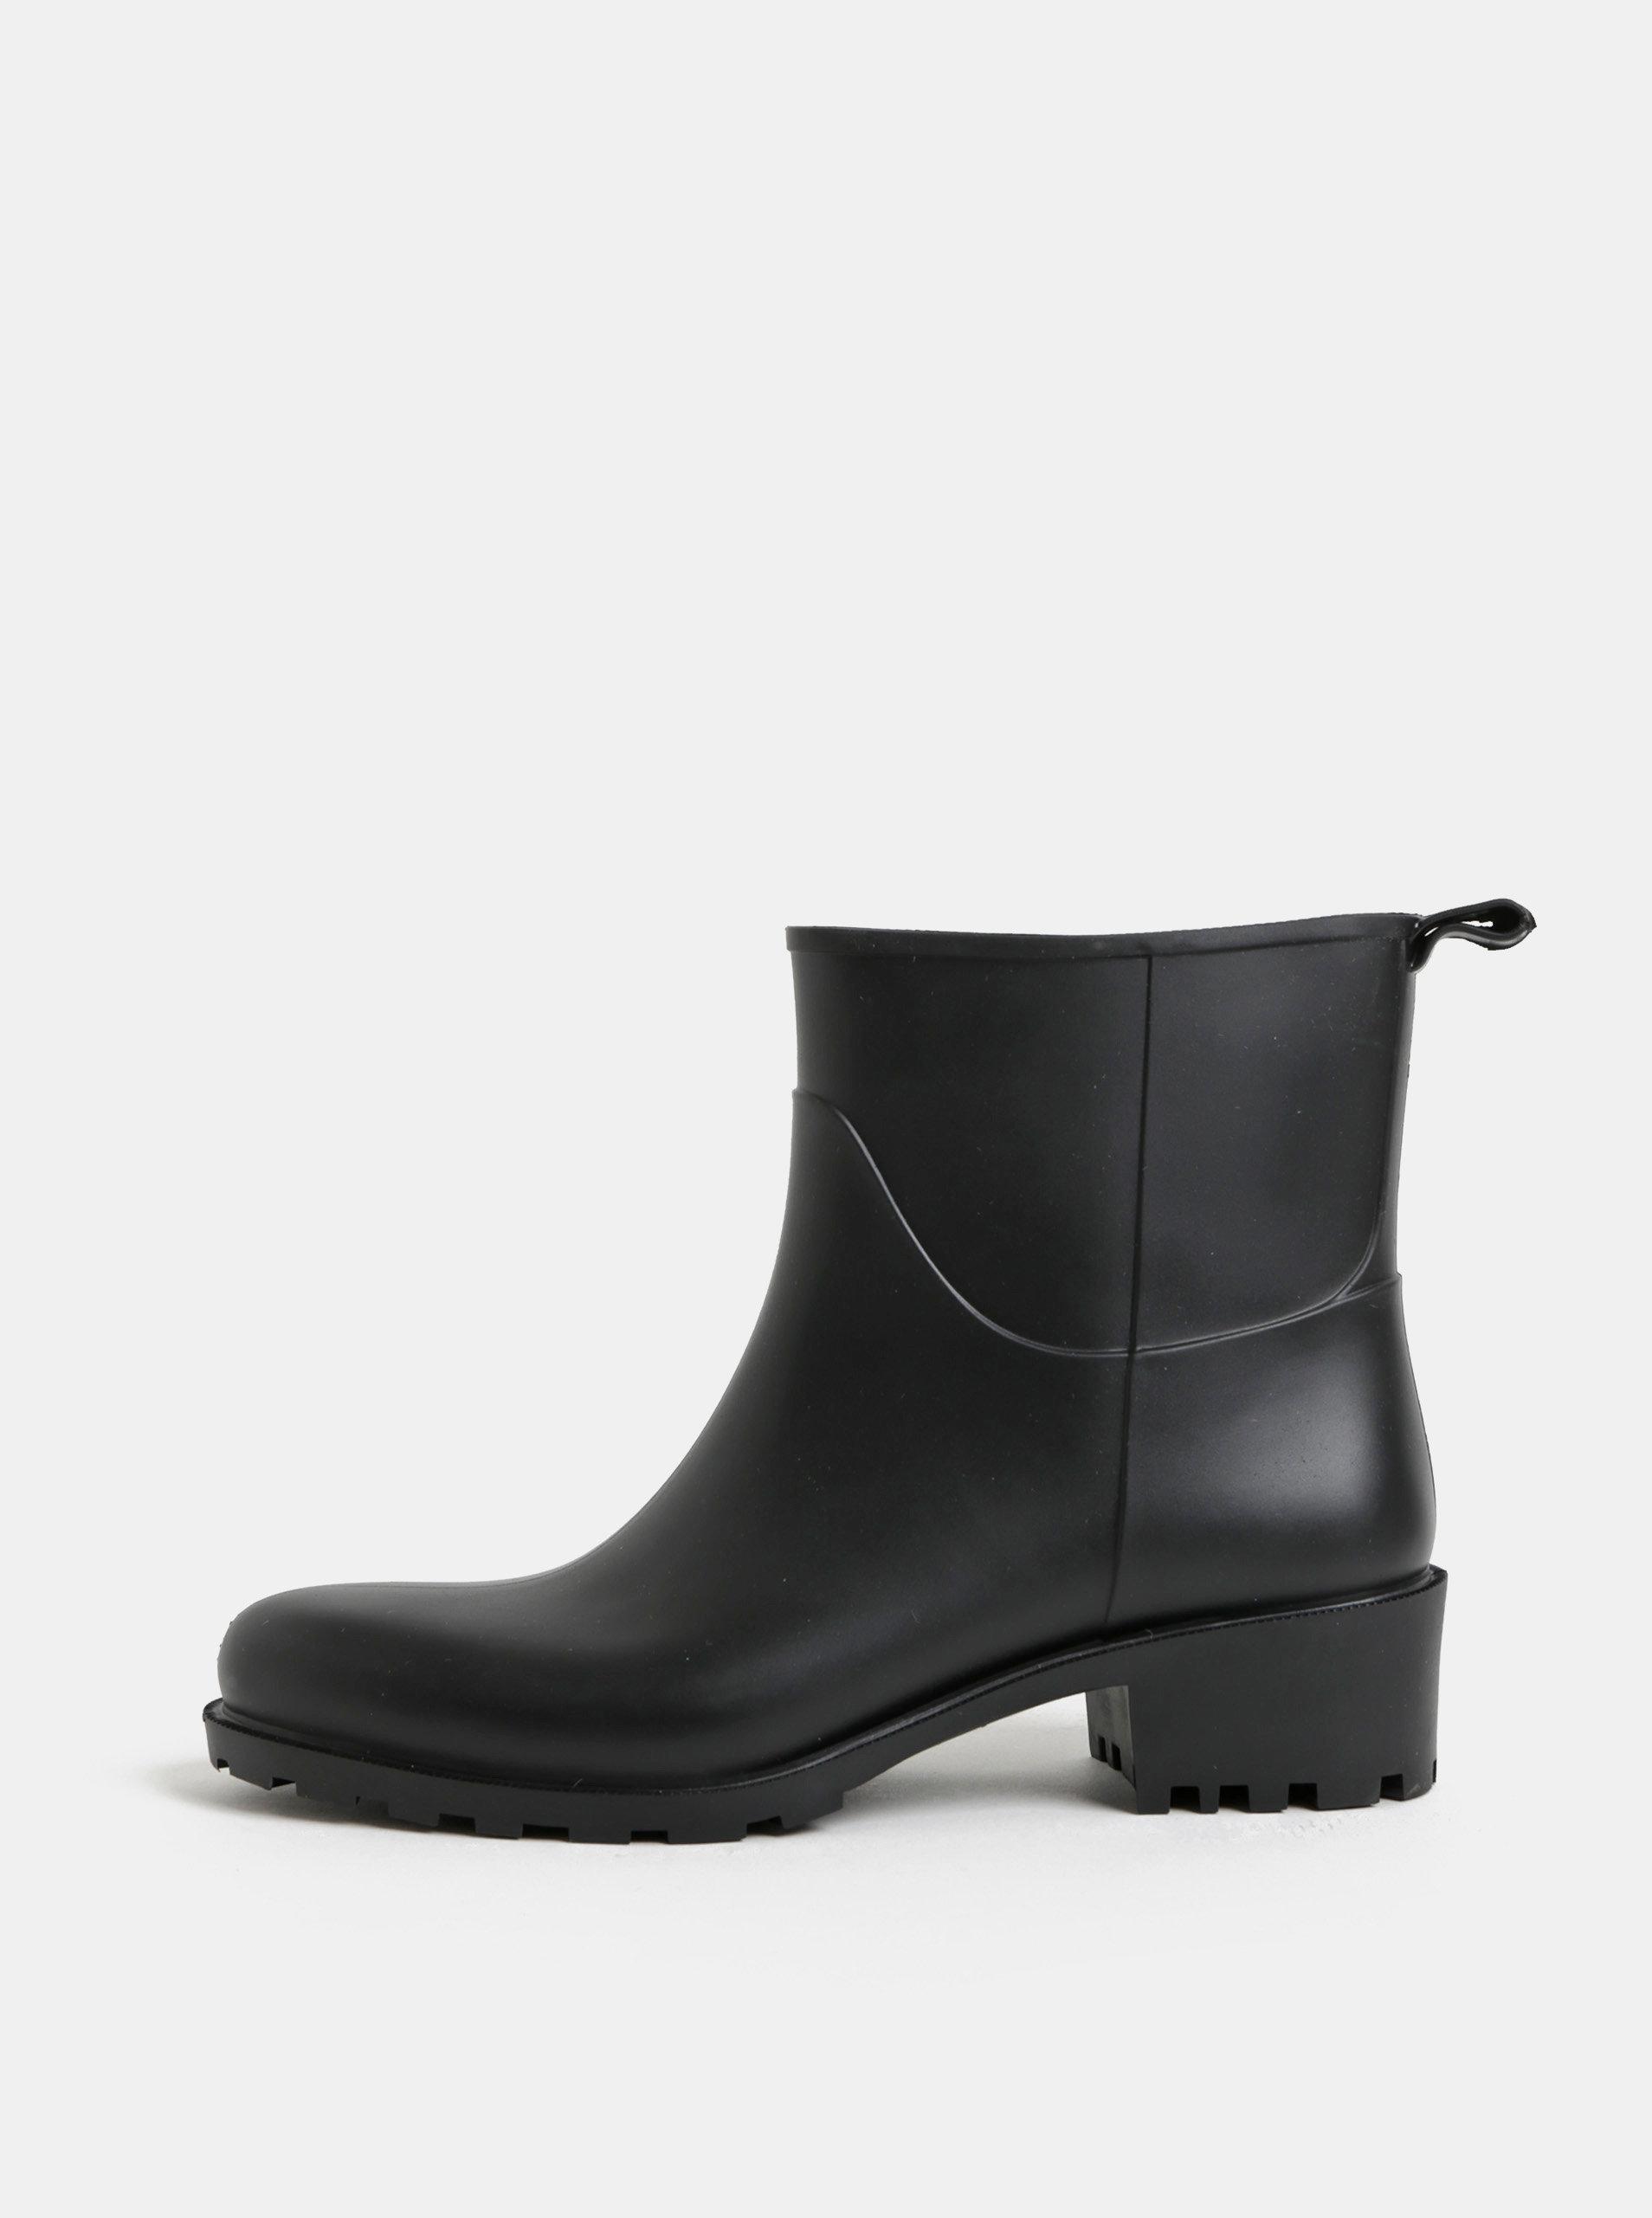 Čierne gumové členkové topánky na podpätku OJJU ... dc6dadac277